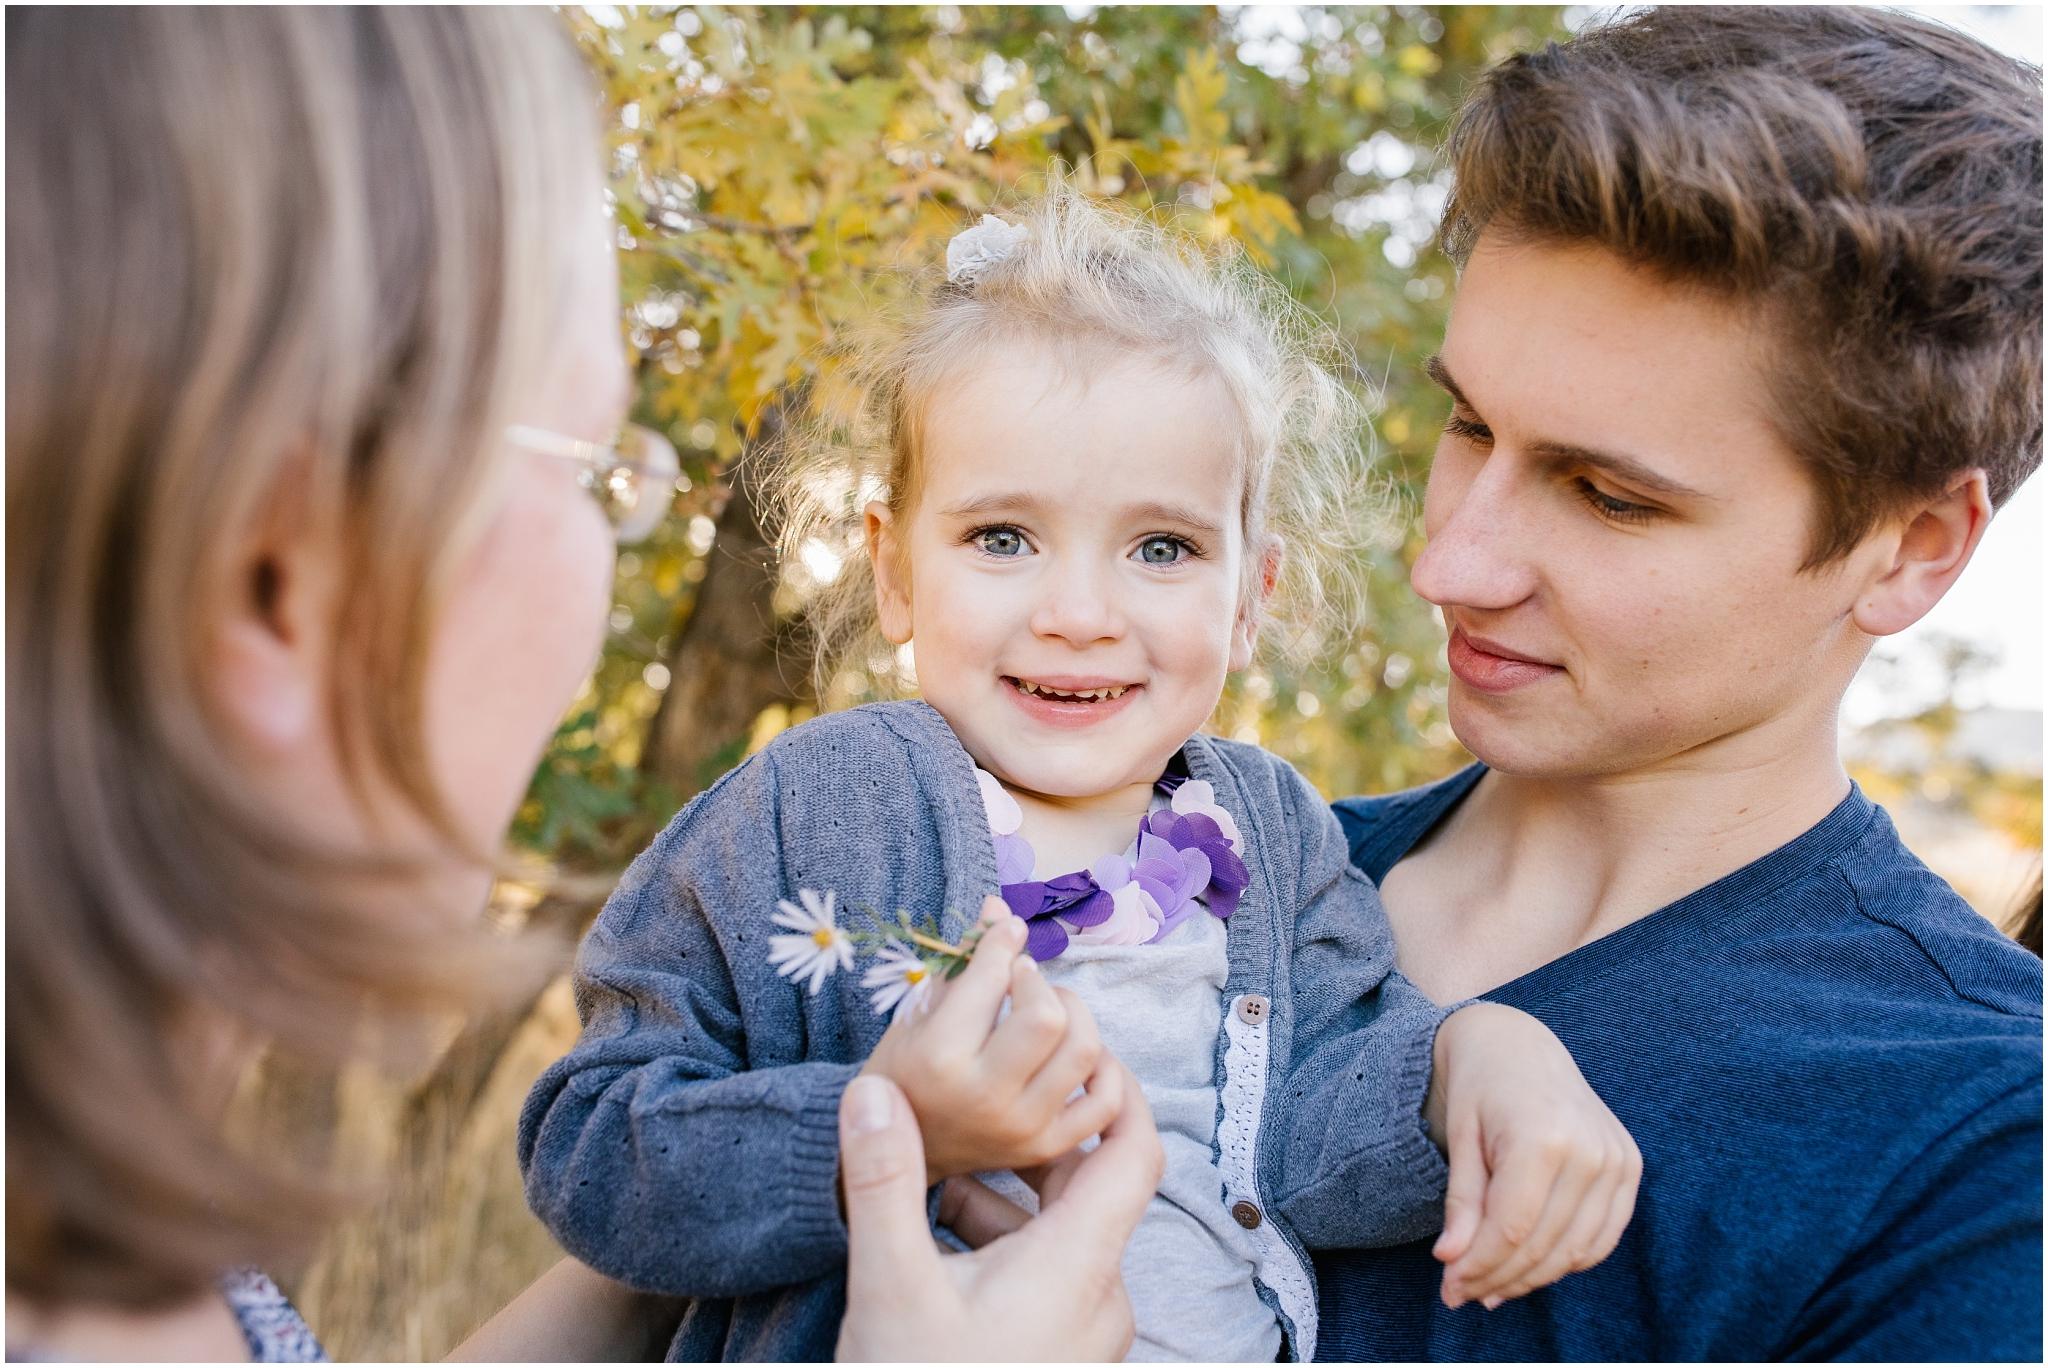 Jaursch-18_Lizzie-B-Imagery-Utah-Family-Photographer-Salt-Lake-City-Park-City-Herriman-Utah-County.jpg